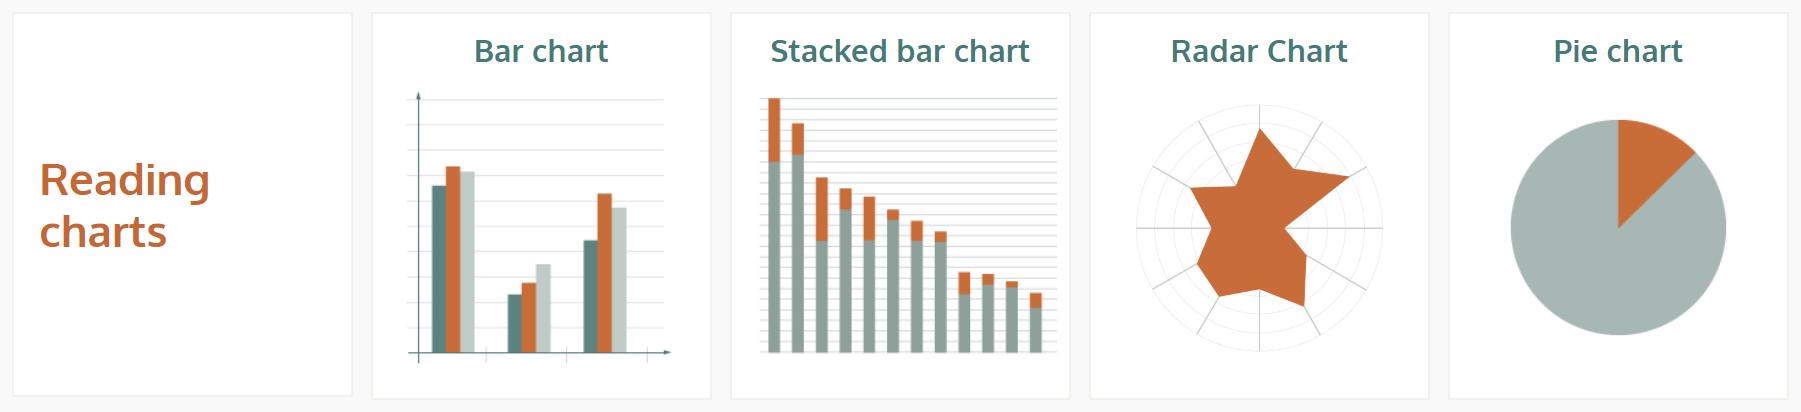 Reading charts